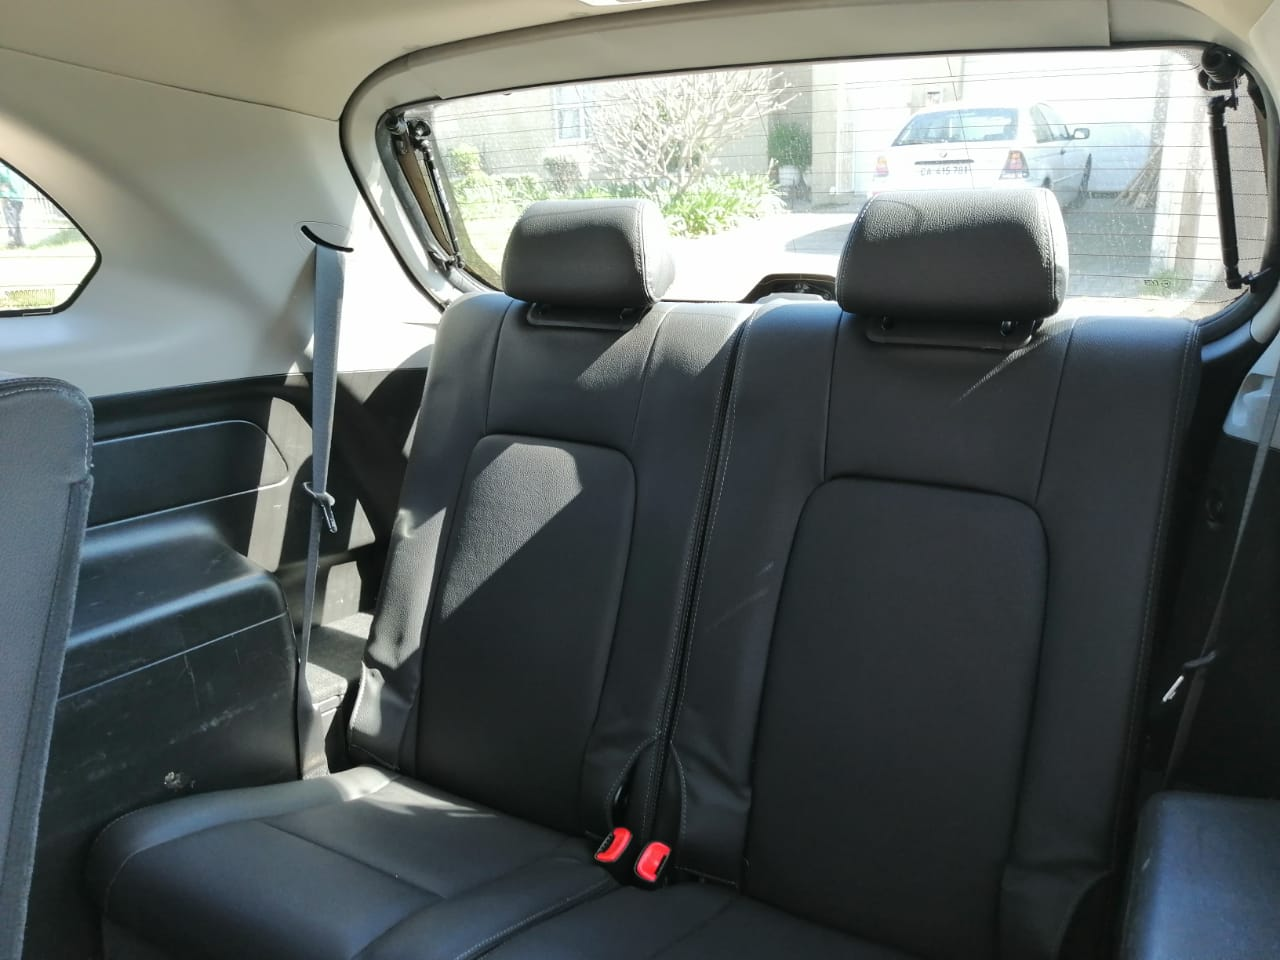 2012 Chevrolet Captiva 2.4 LT 4x2